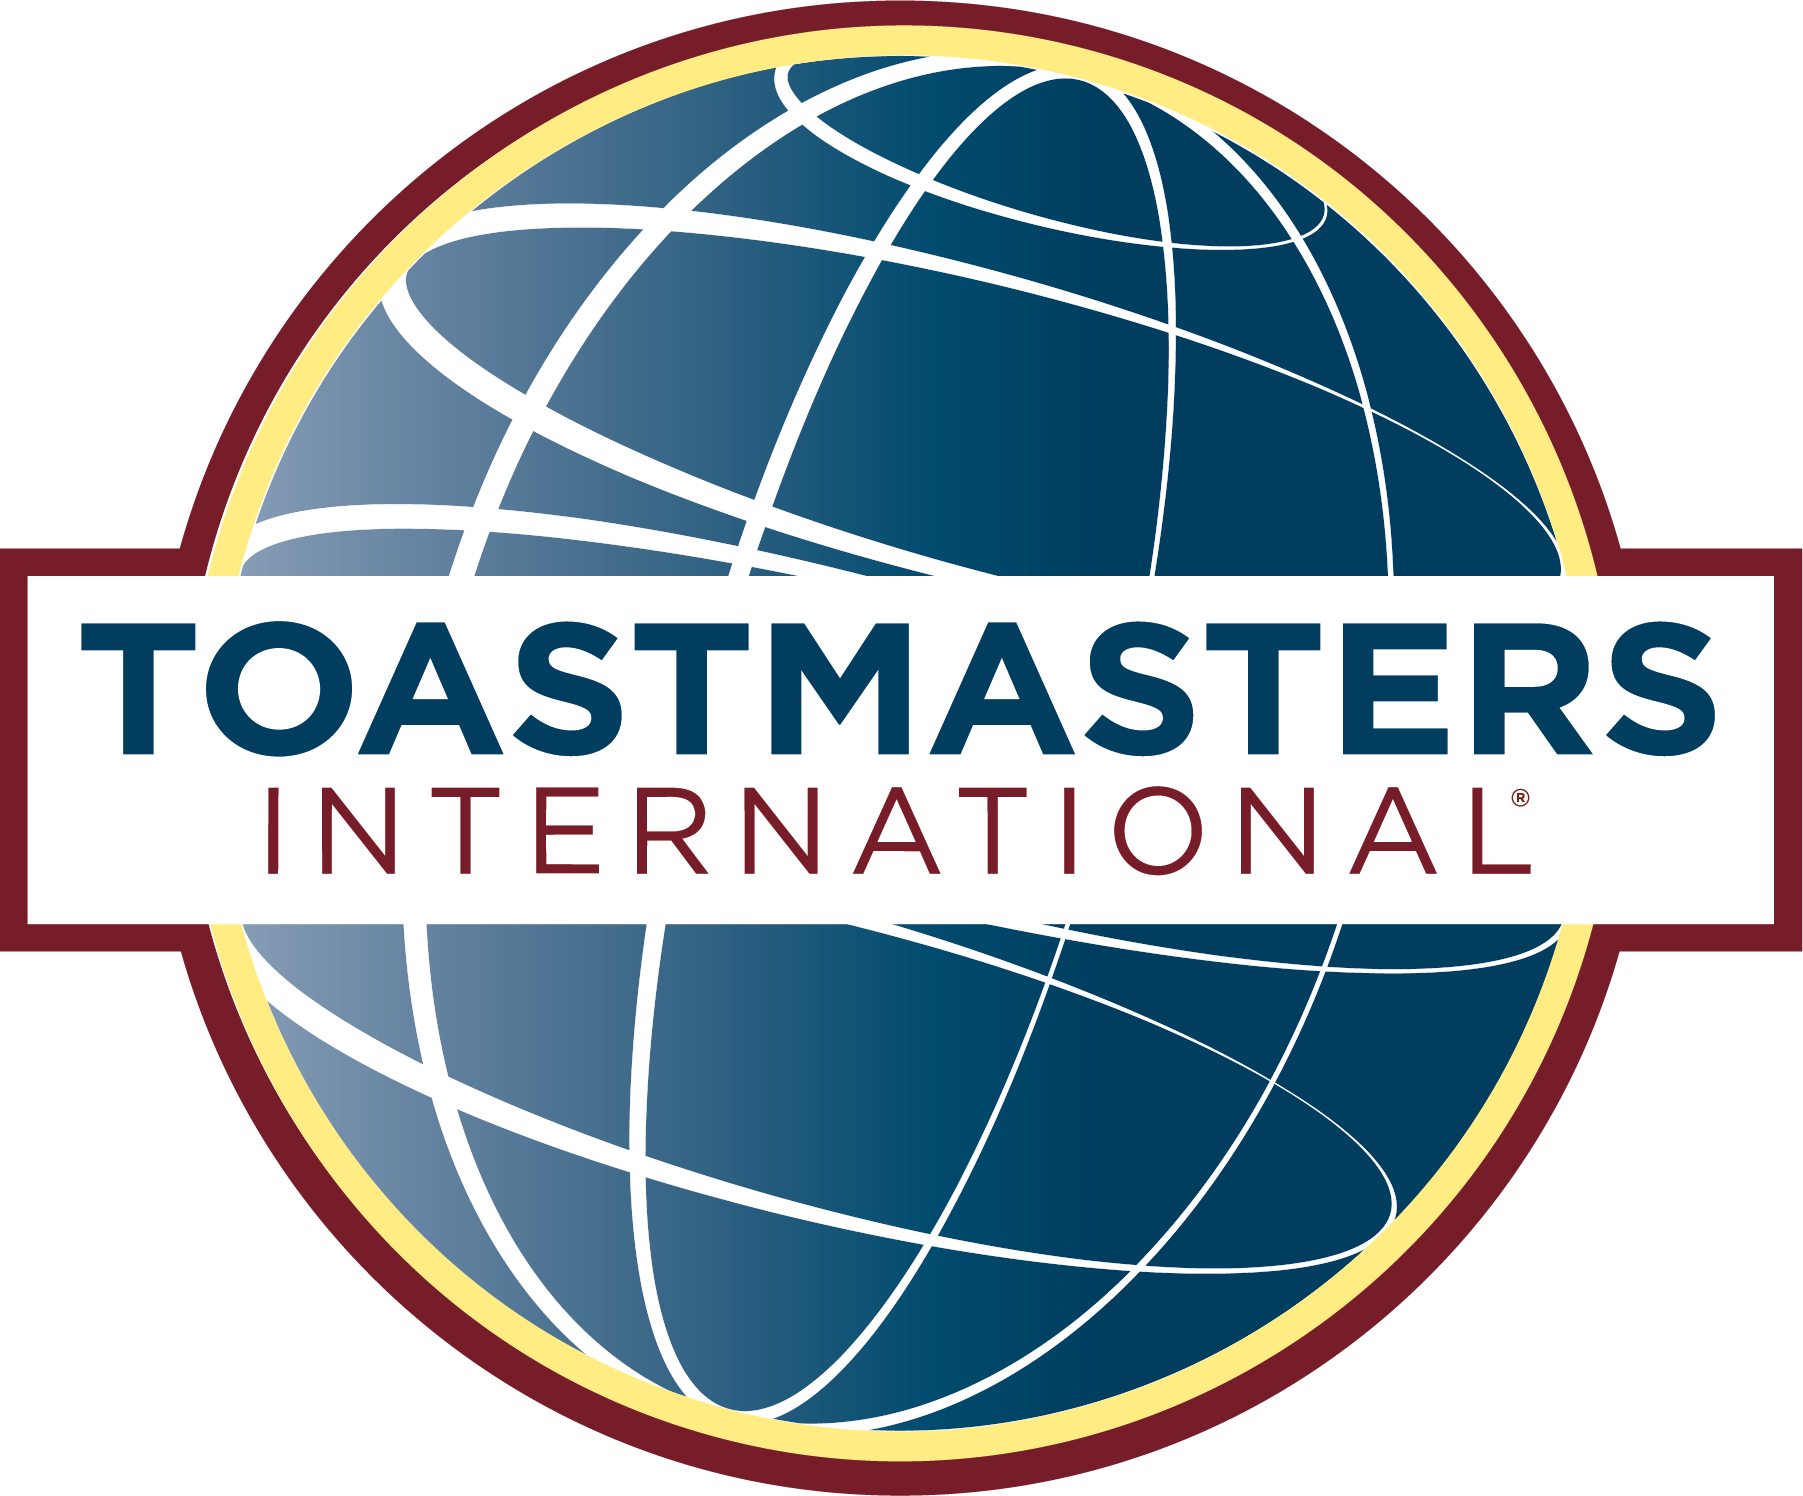 DEVENIR UN ORATEUR BRILLANT AVEC TOASTMASTERS INTERNATIONAL